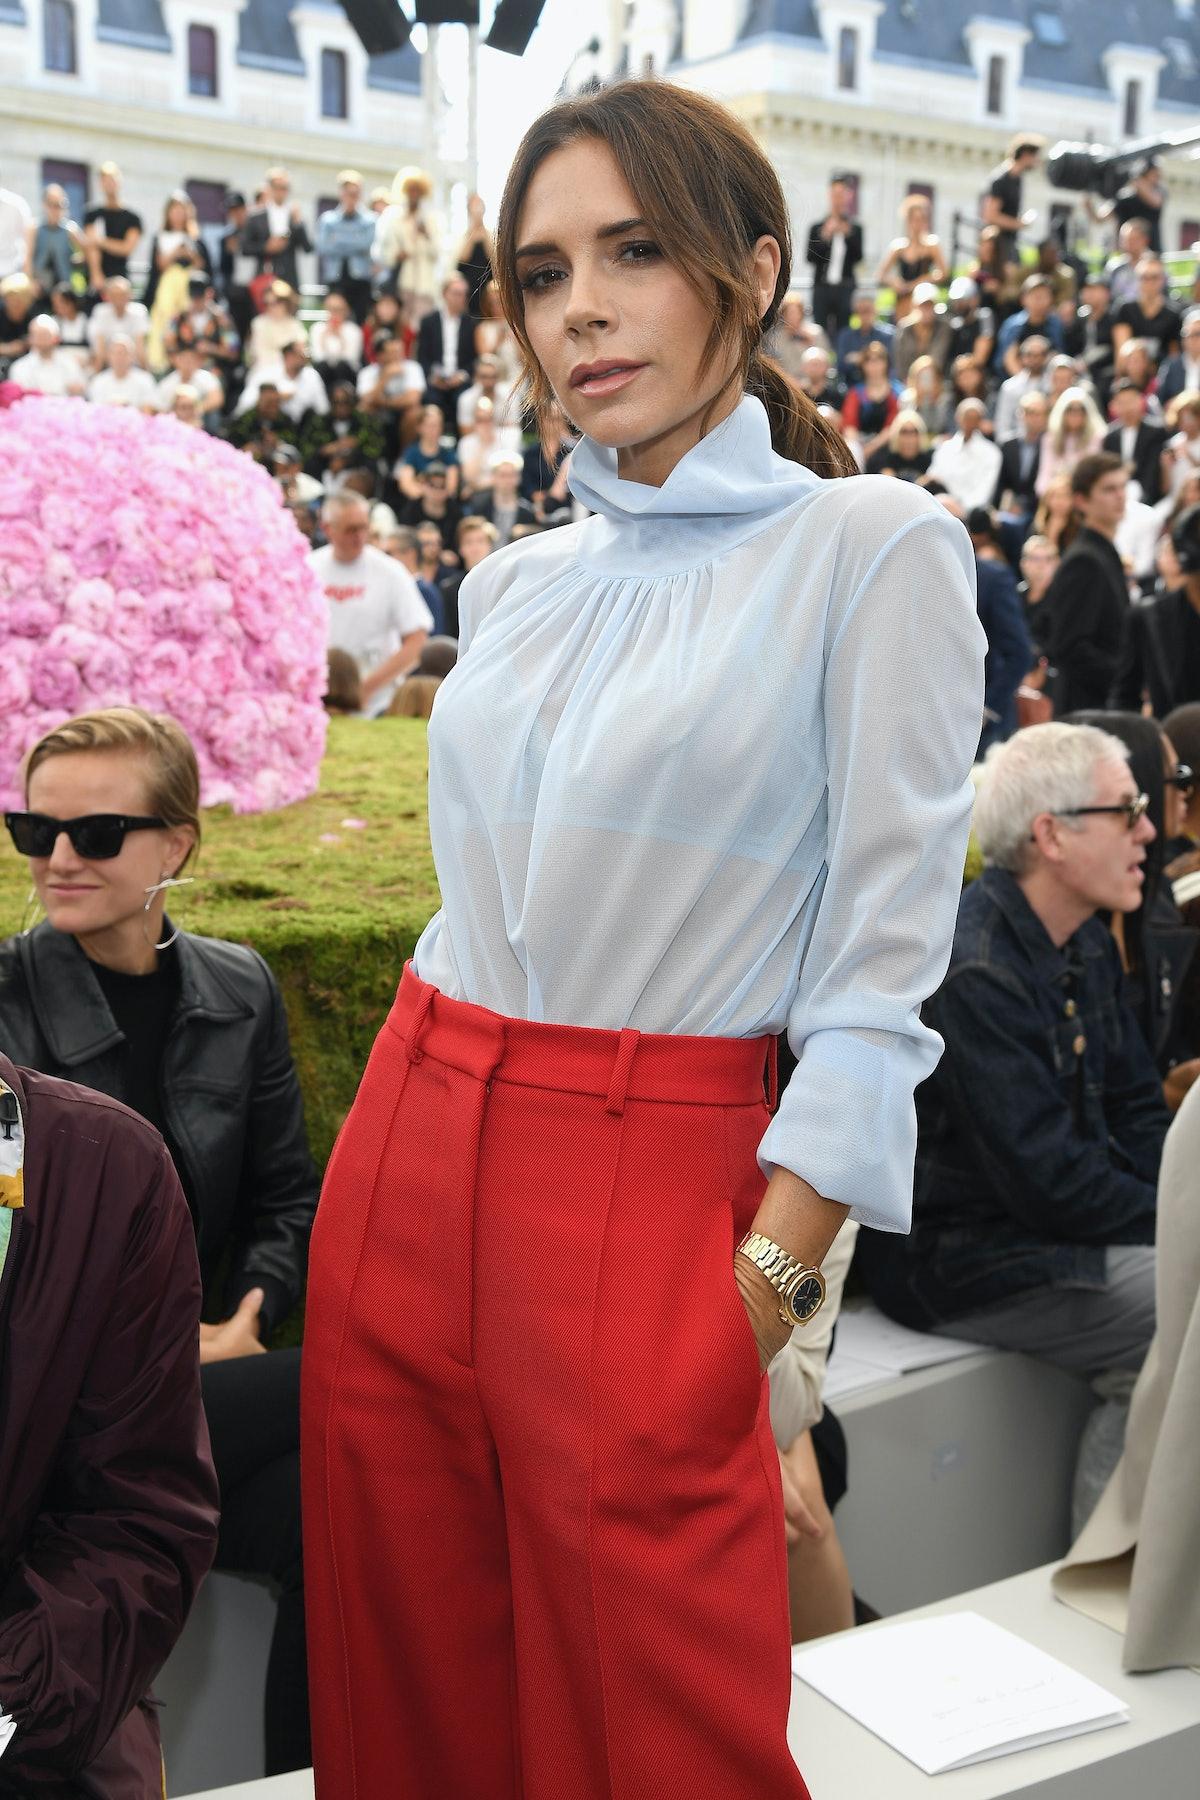 PARIS, FRANCE - JUNE 23: Victoria Beckham attends the Dior Homme Menswear Spring/Summer 2019 show as...